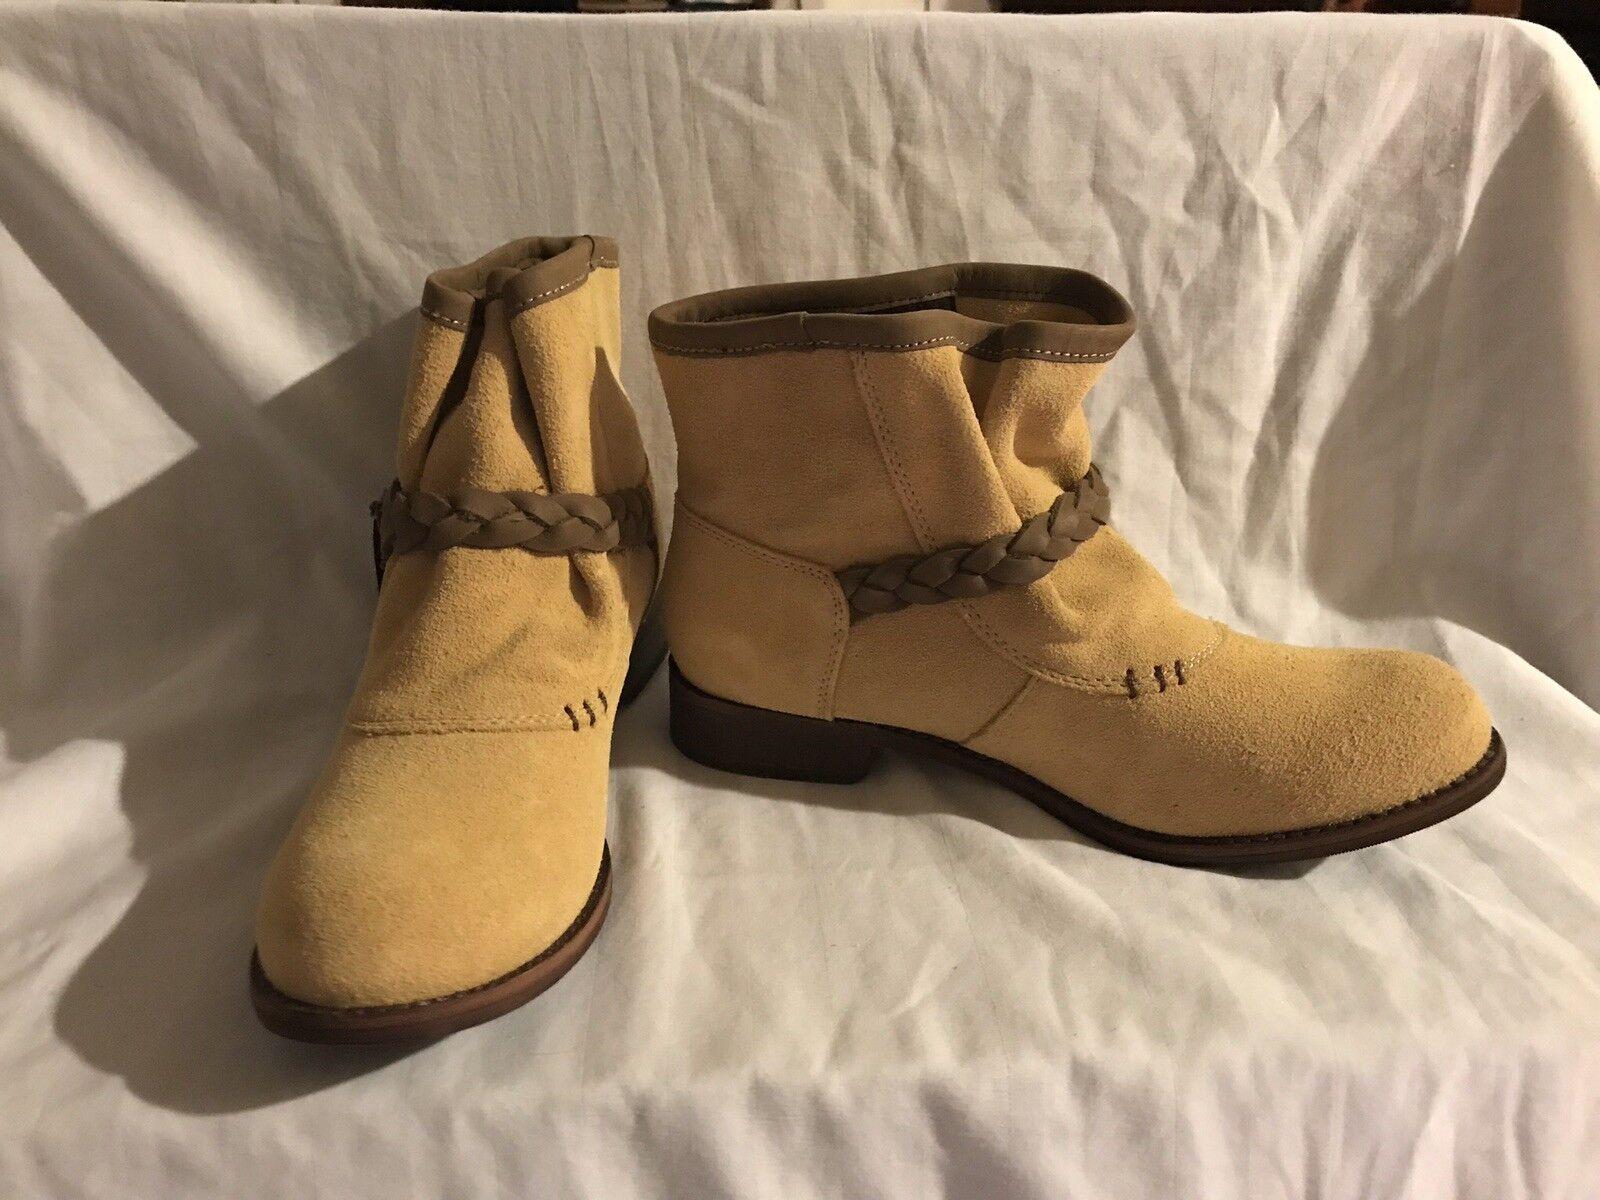 Caterpillar NEW Rita Strap Women's Leather Boots Size 7 Retail  165.00